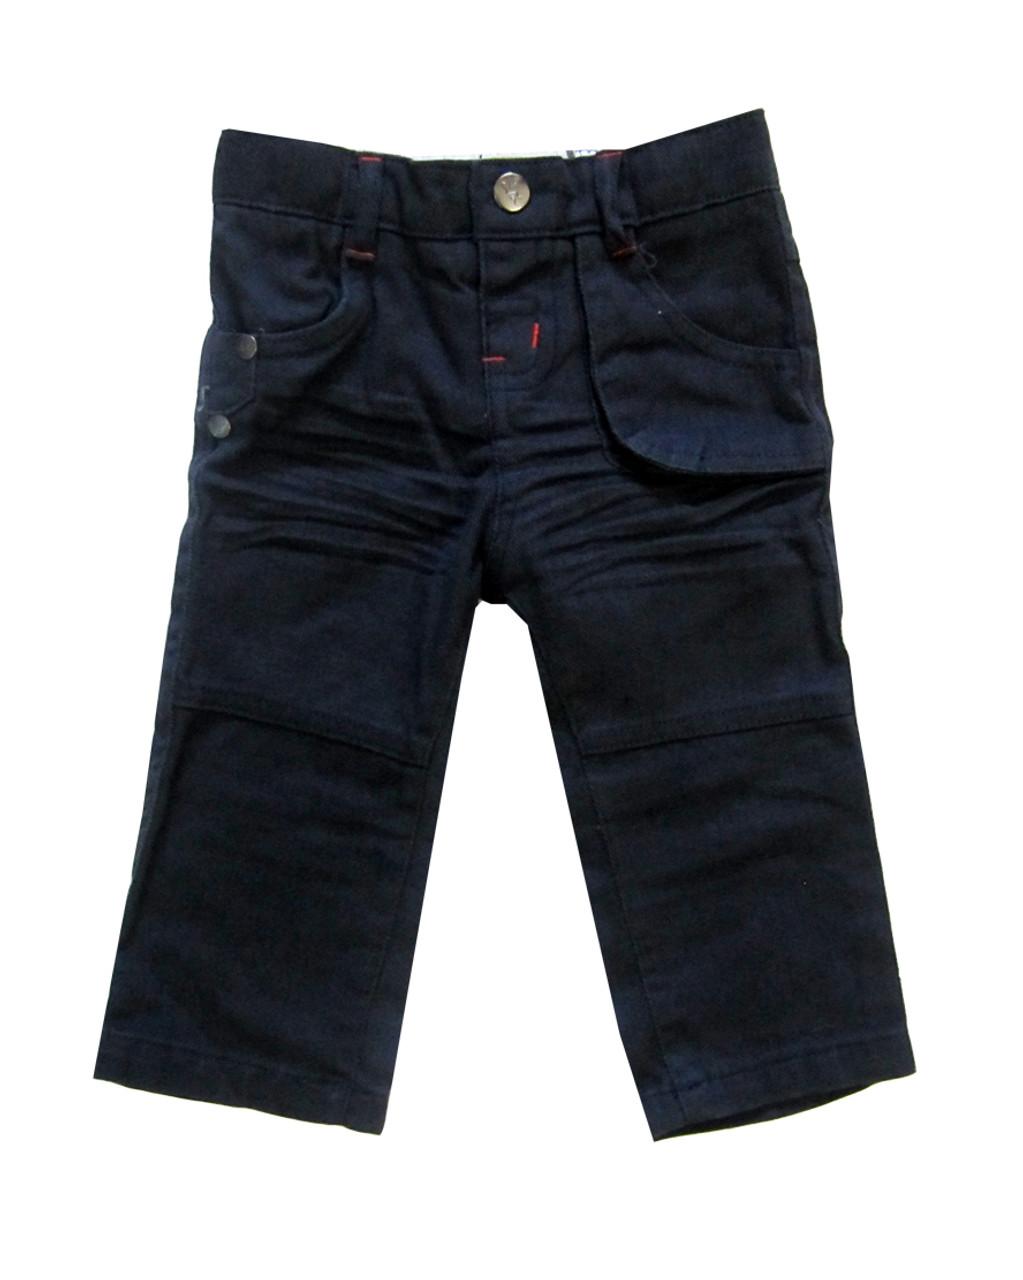 CDHL99 Mountain Bike Race Kids Girl Boy Short Sleeve Romper Pajamas 0-24 Months